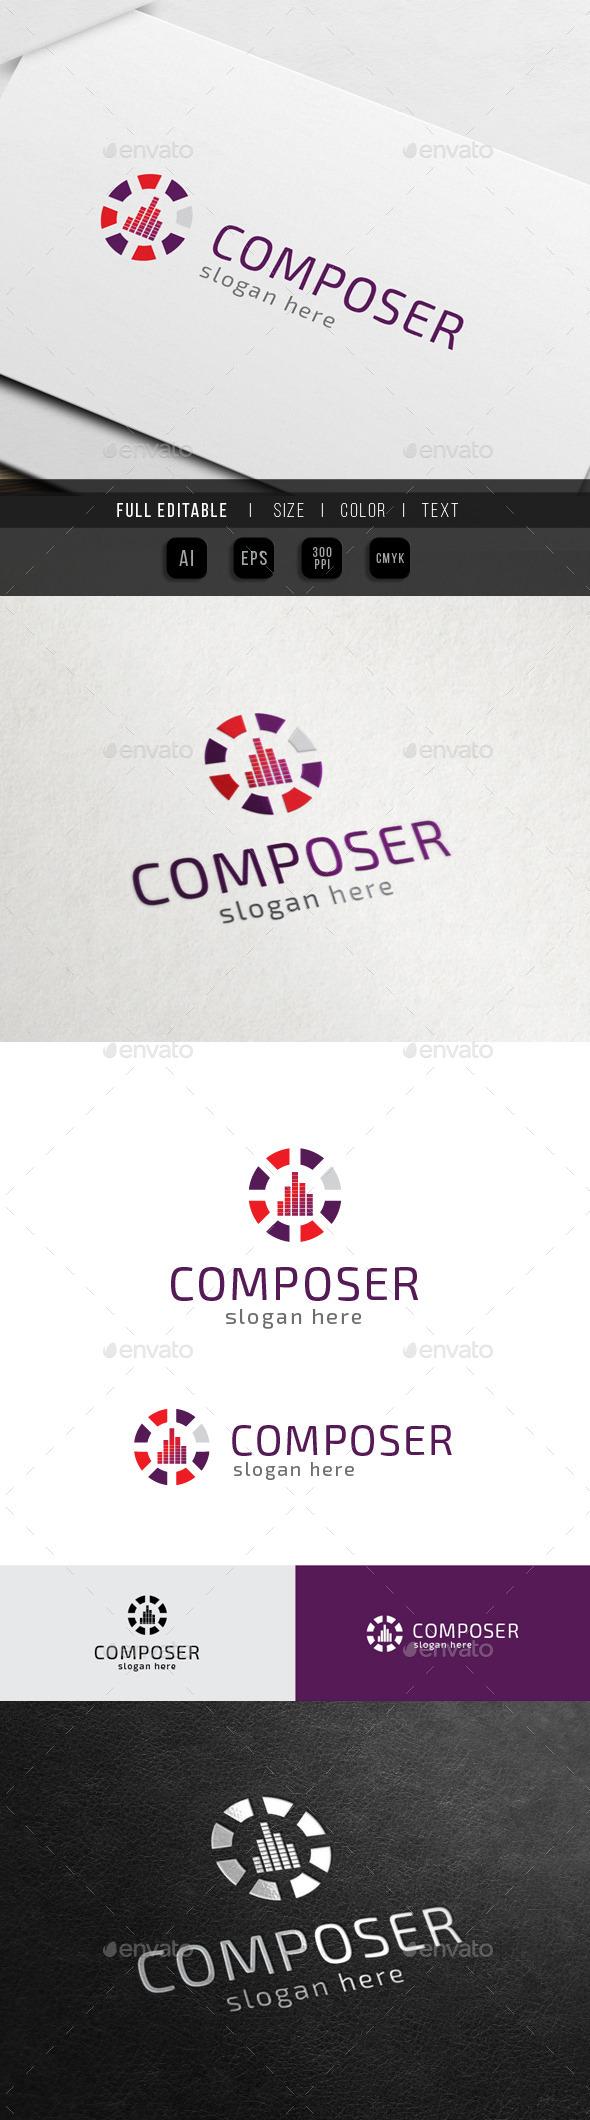 Sound Mixing - Music Composer - Symbols Logo Templates